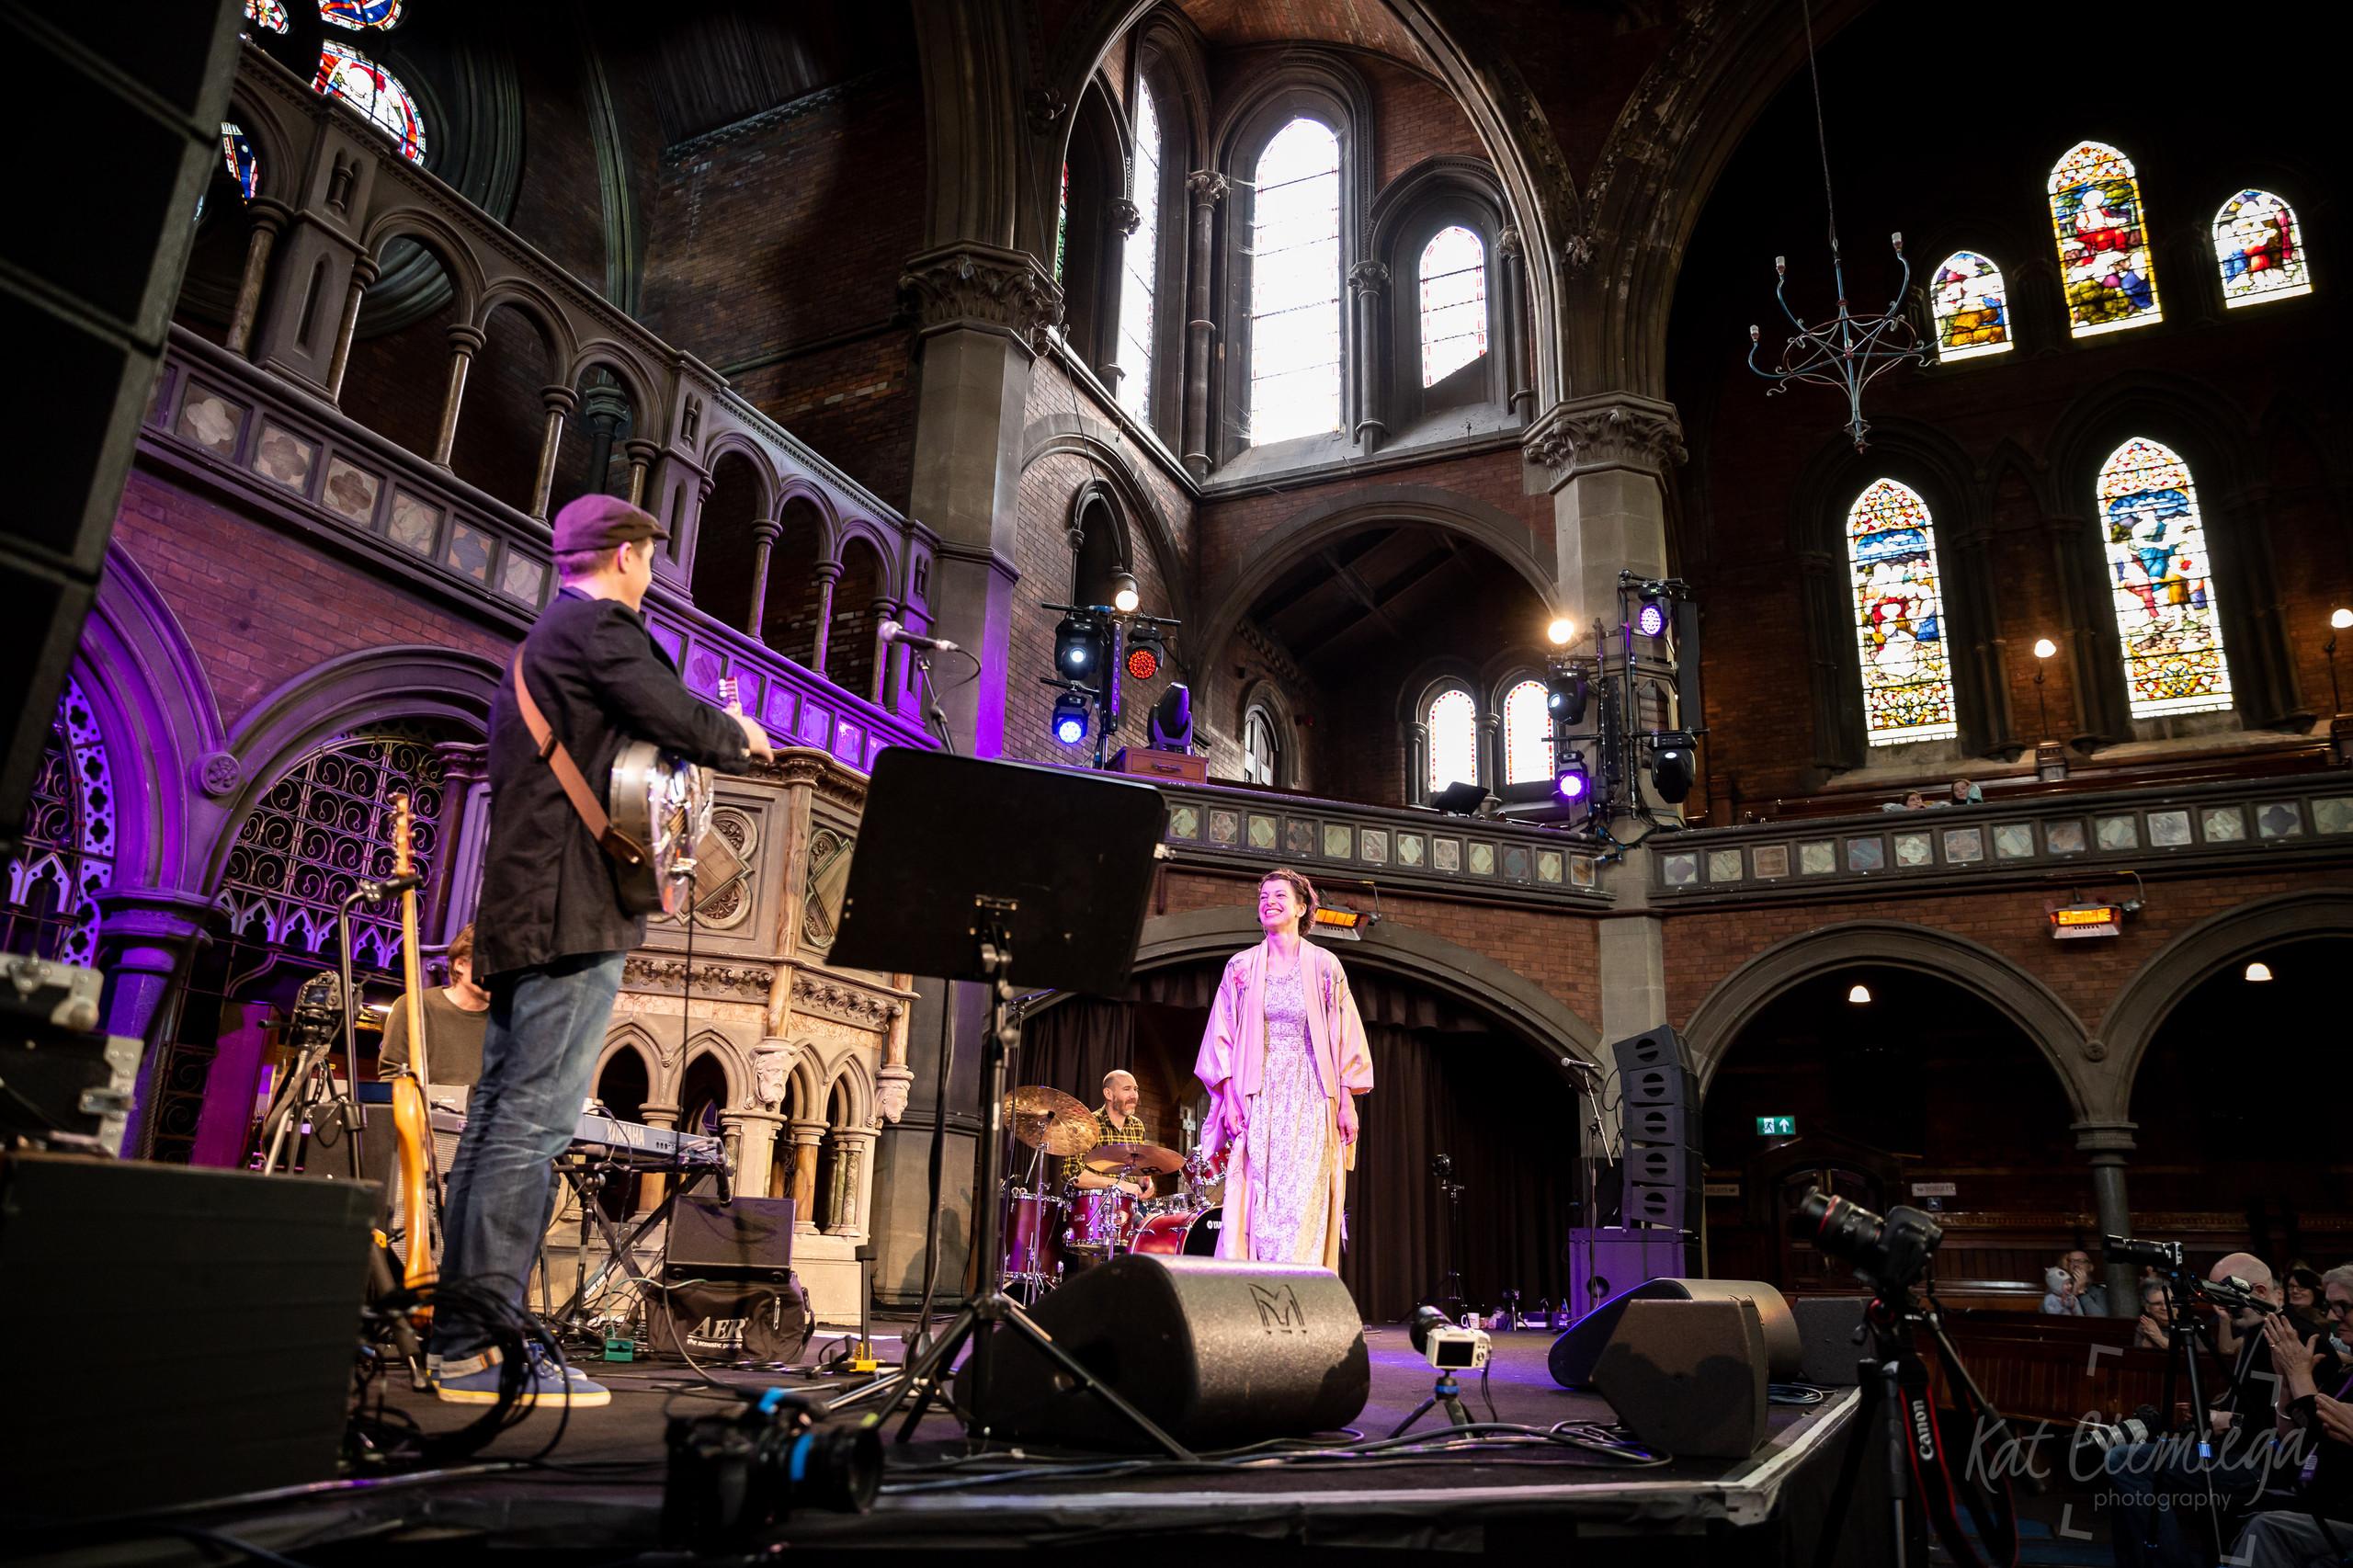 Kat Ciemiega Photography Daylight Music event; live music London, London Dreamtime